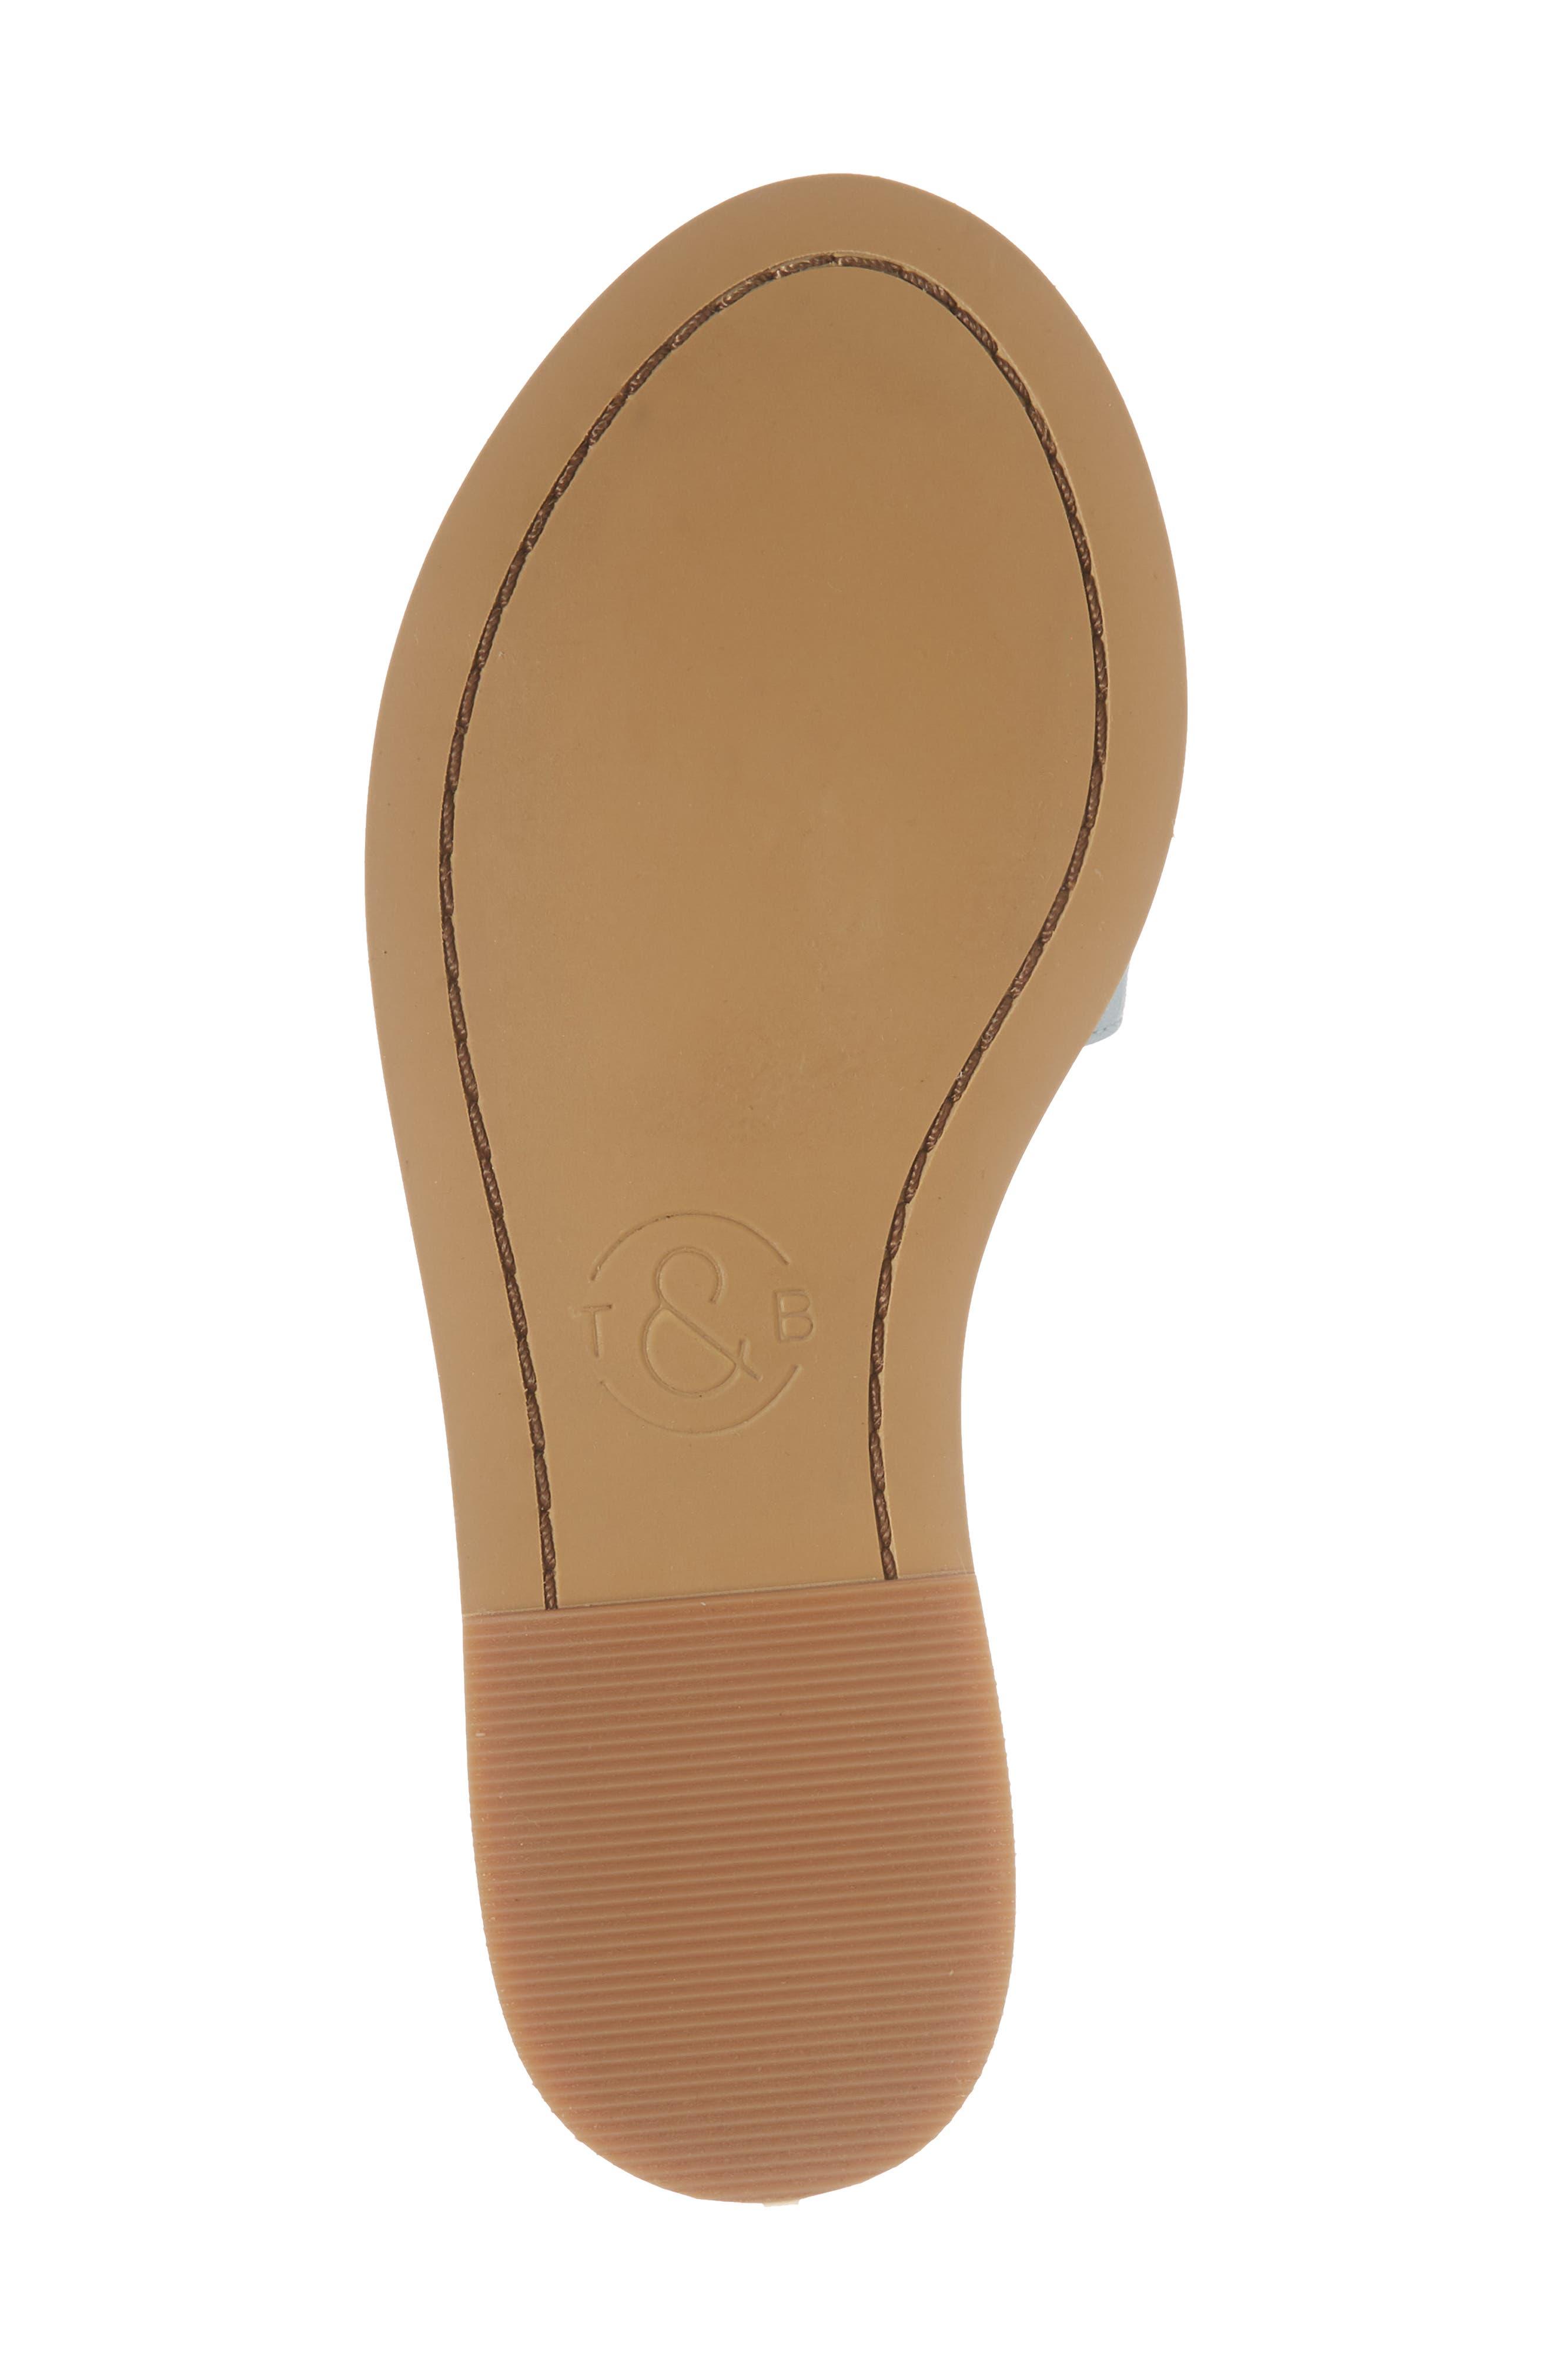 Mia Slide Sandal,                             Alternate thumbnail 6, color,                             Aqua Faux Leather